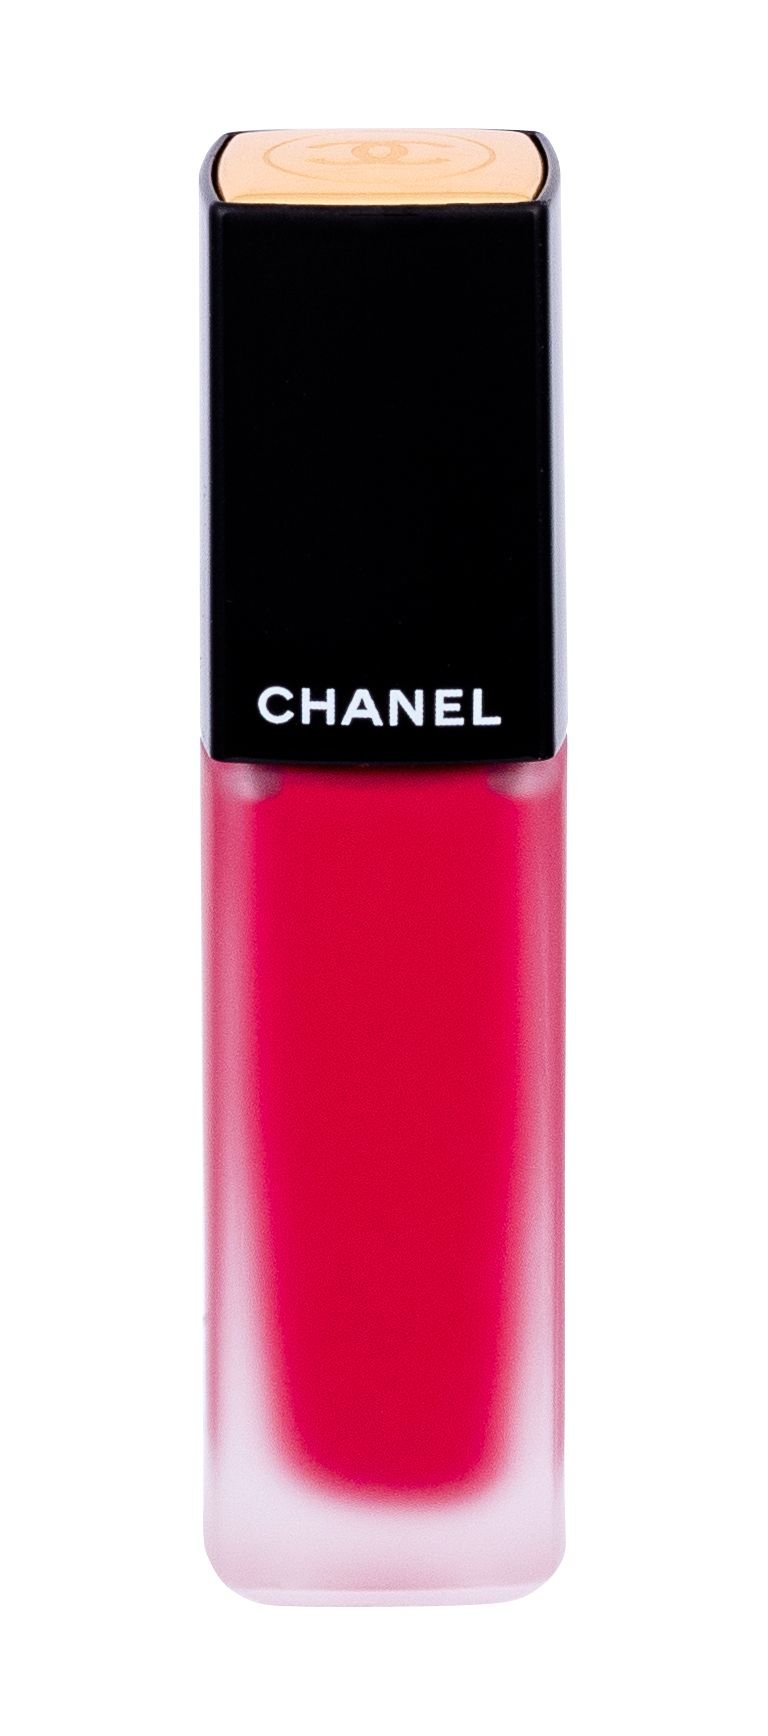 Chanel Rouge Allure Lipstick 6ml 150 Luxuriant